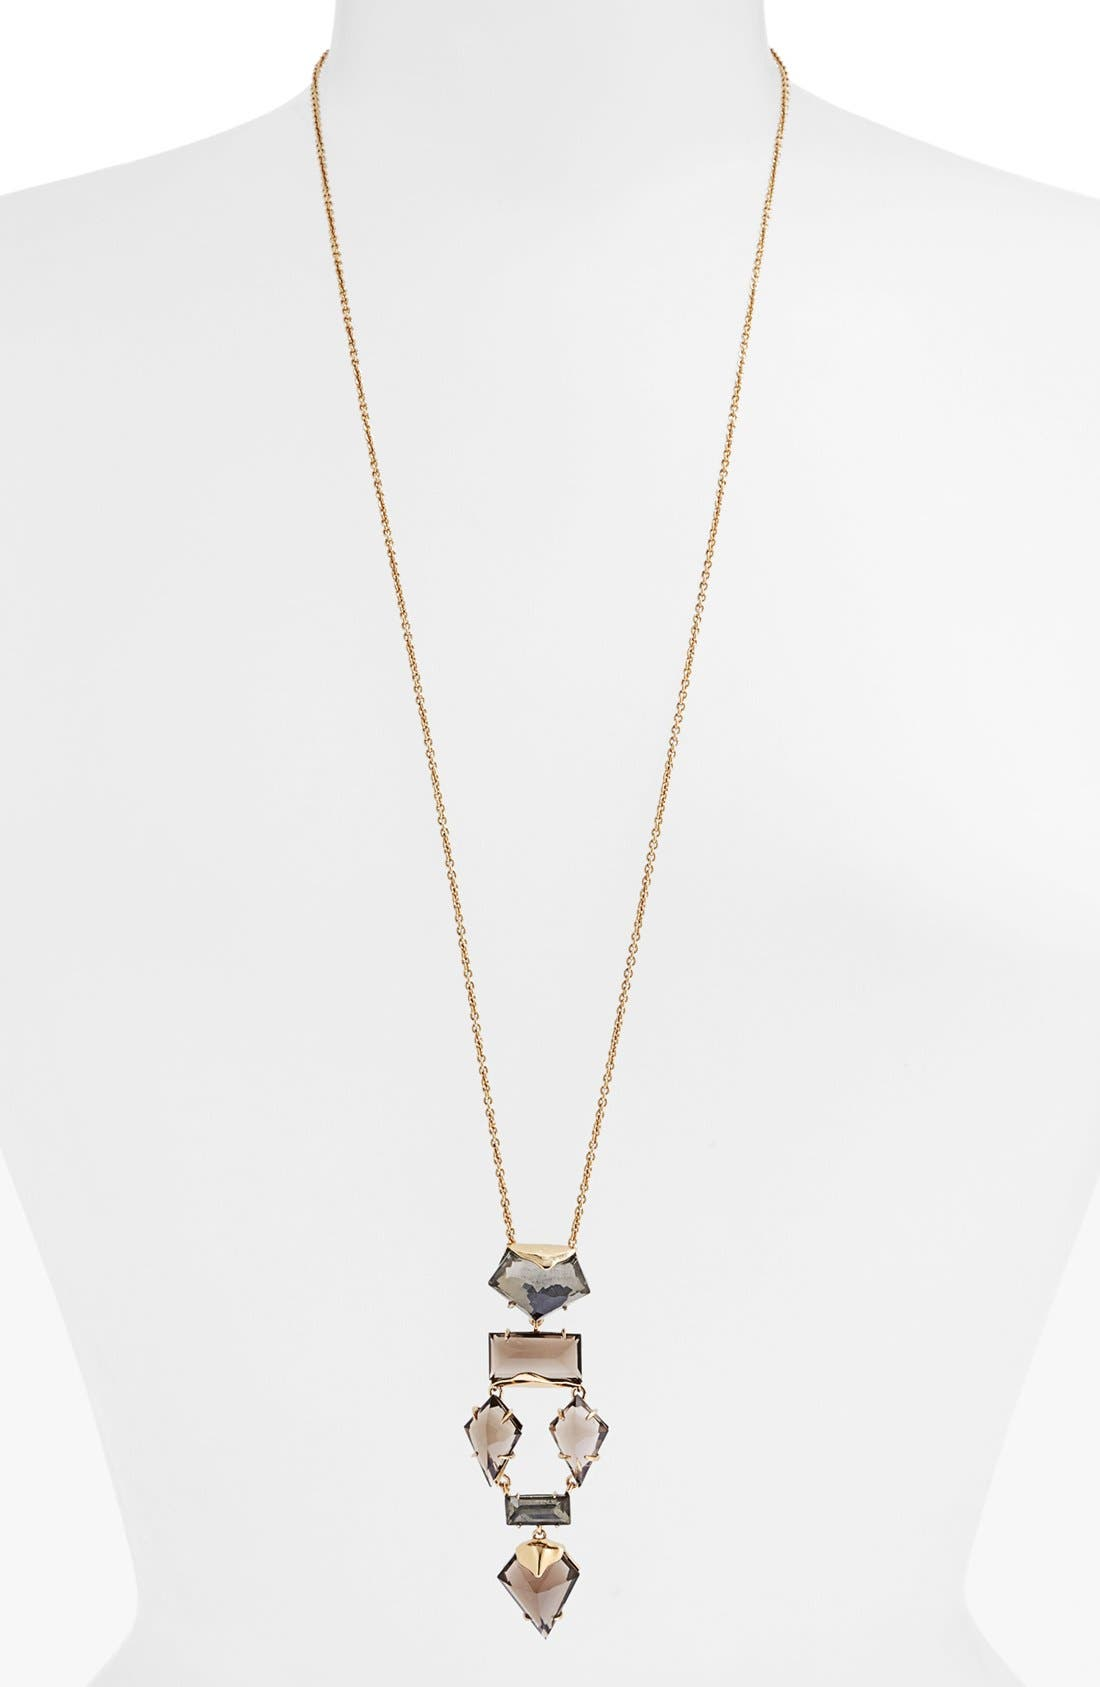 Main Image - Alexis Bittar 'Miss Havisham' Long Pendant Necklace